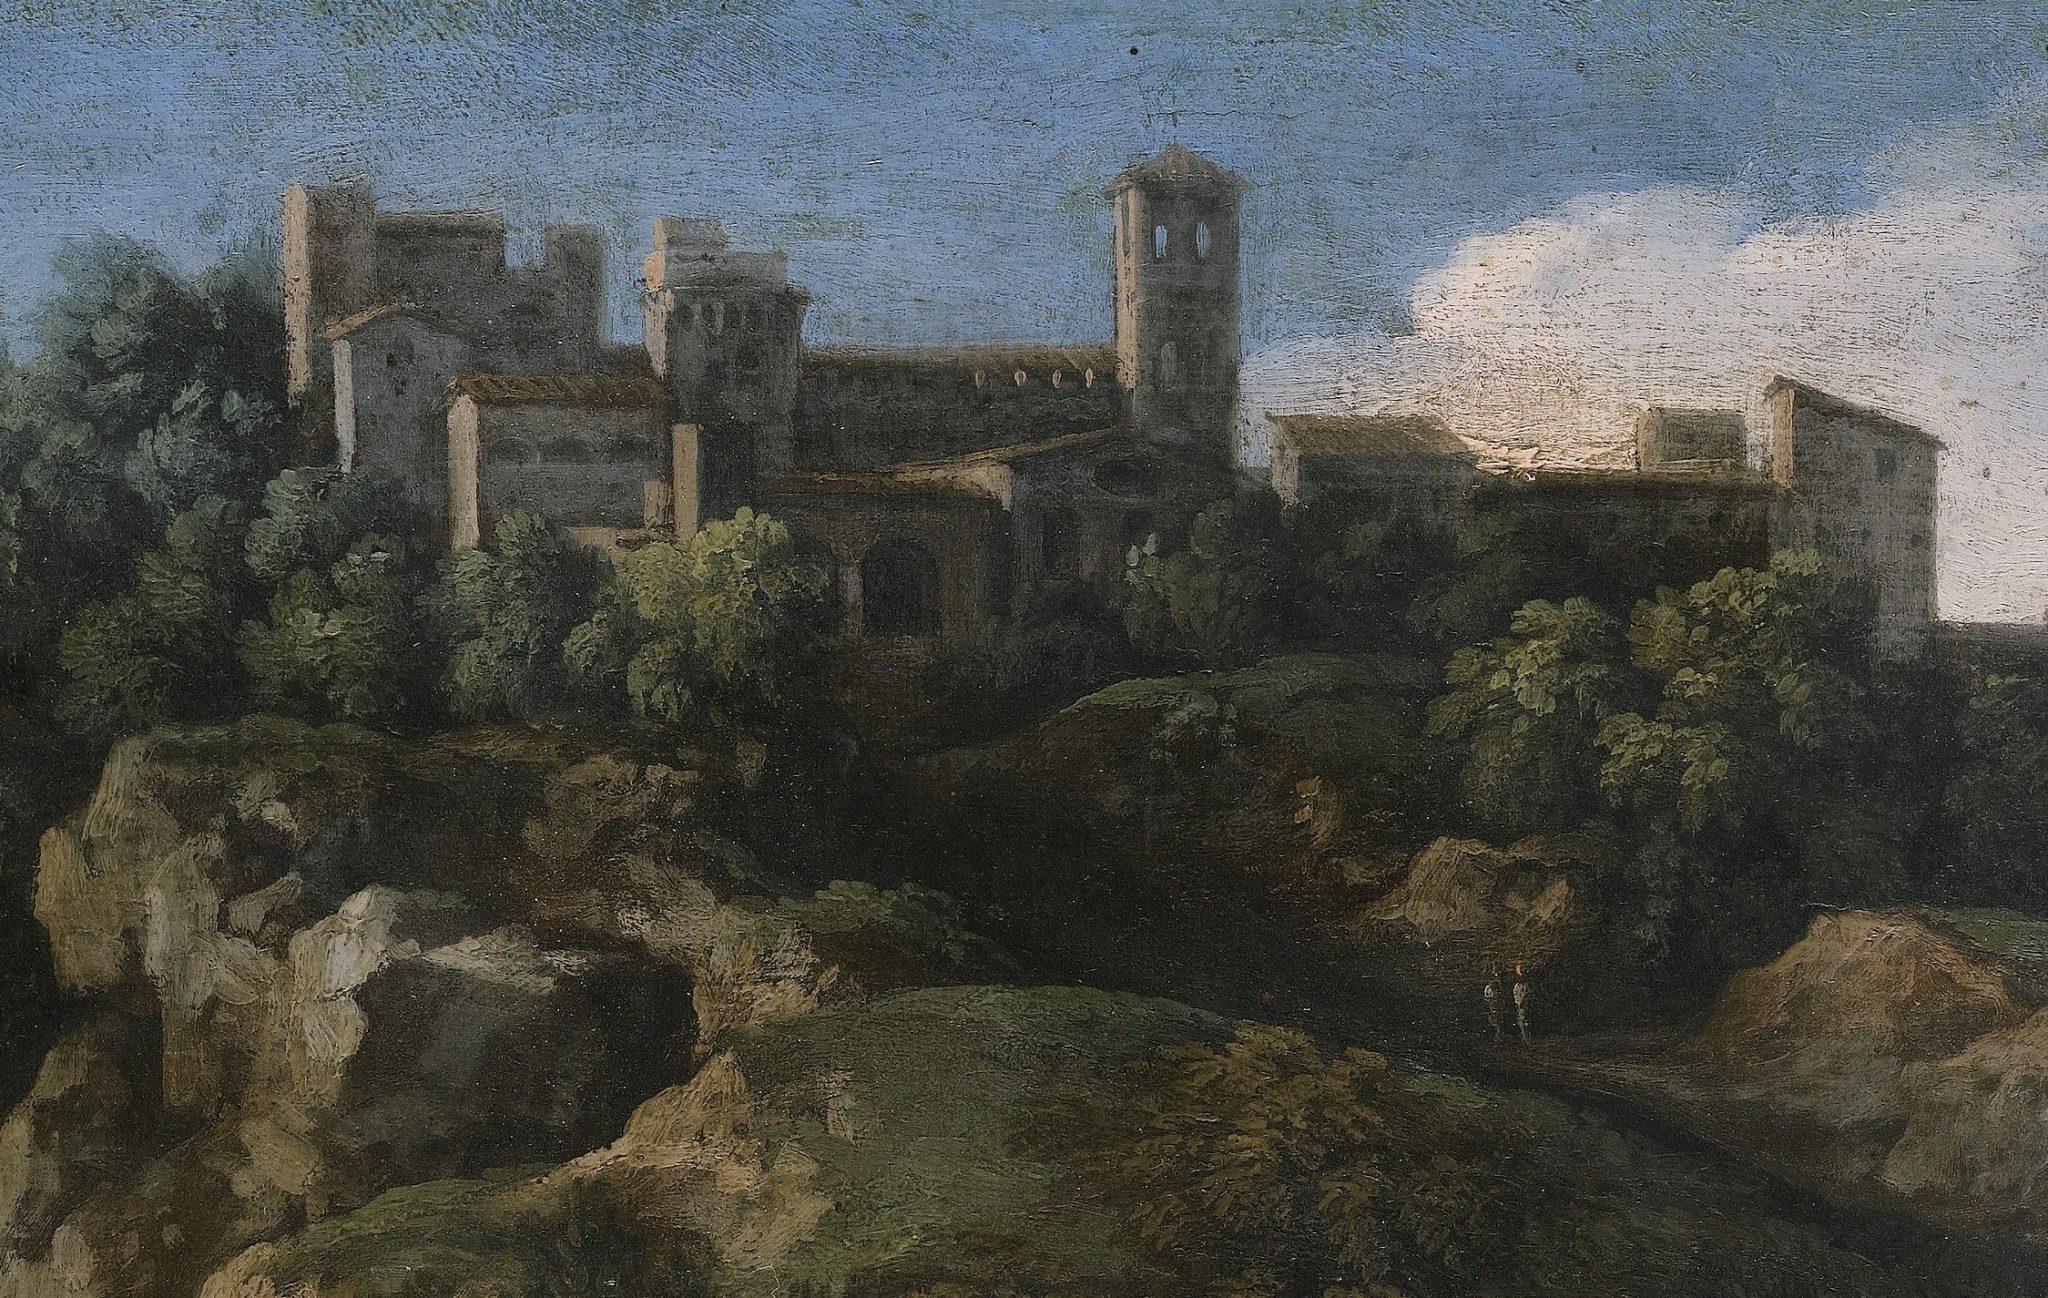 A rocky roman landscape with a hilltop town